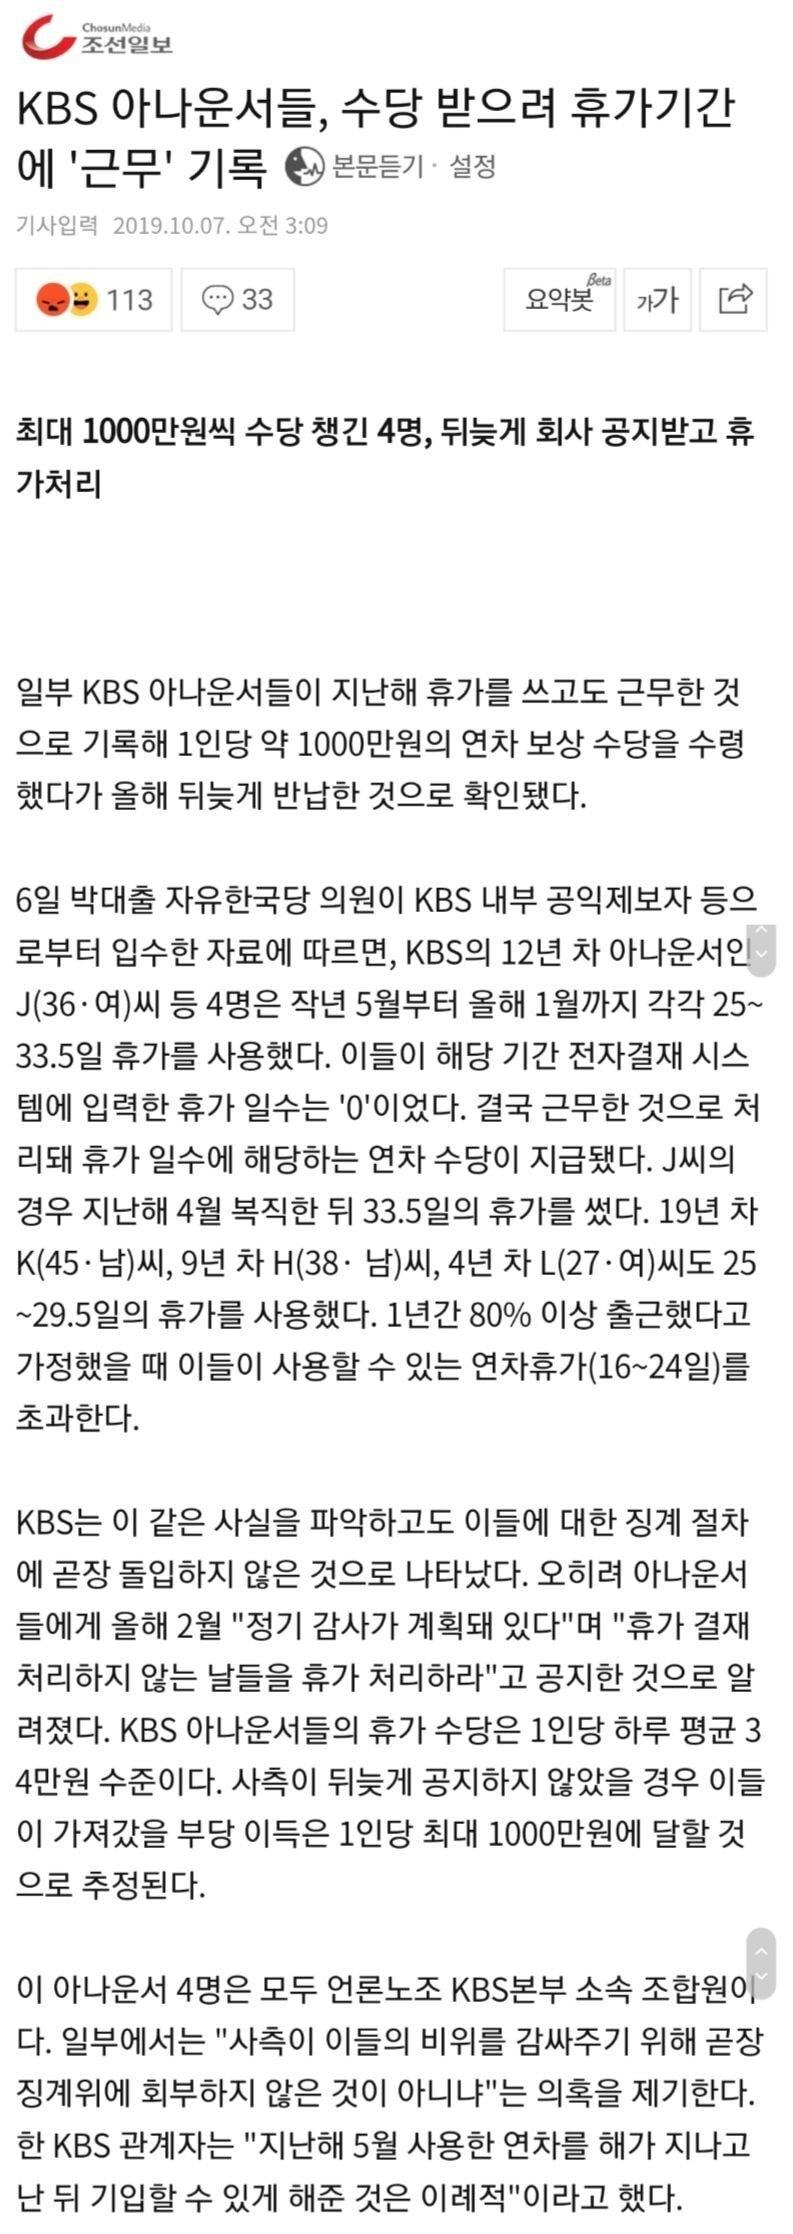 KBS%2B%25EC%2595%2584%25EB%2582%2598%25EC%259A%25B4%25EC%2584%259C%25EB%2593%25A4%25EC%259D%2598%2B%25EB%25A7%258C%25ED%2596%2589.jpg